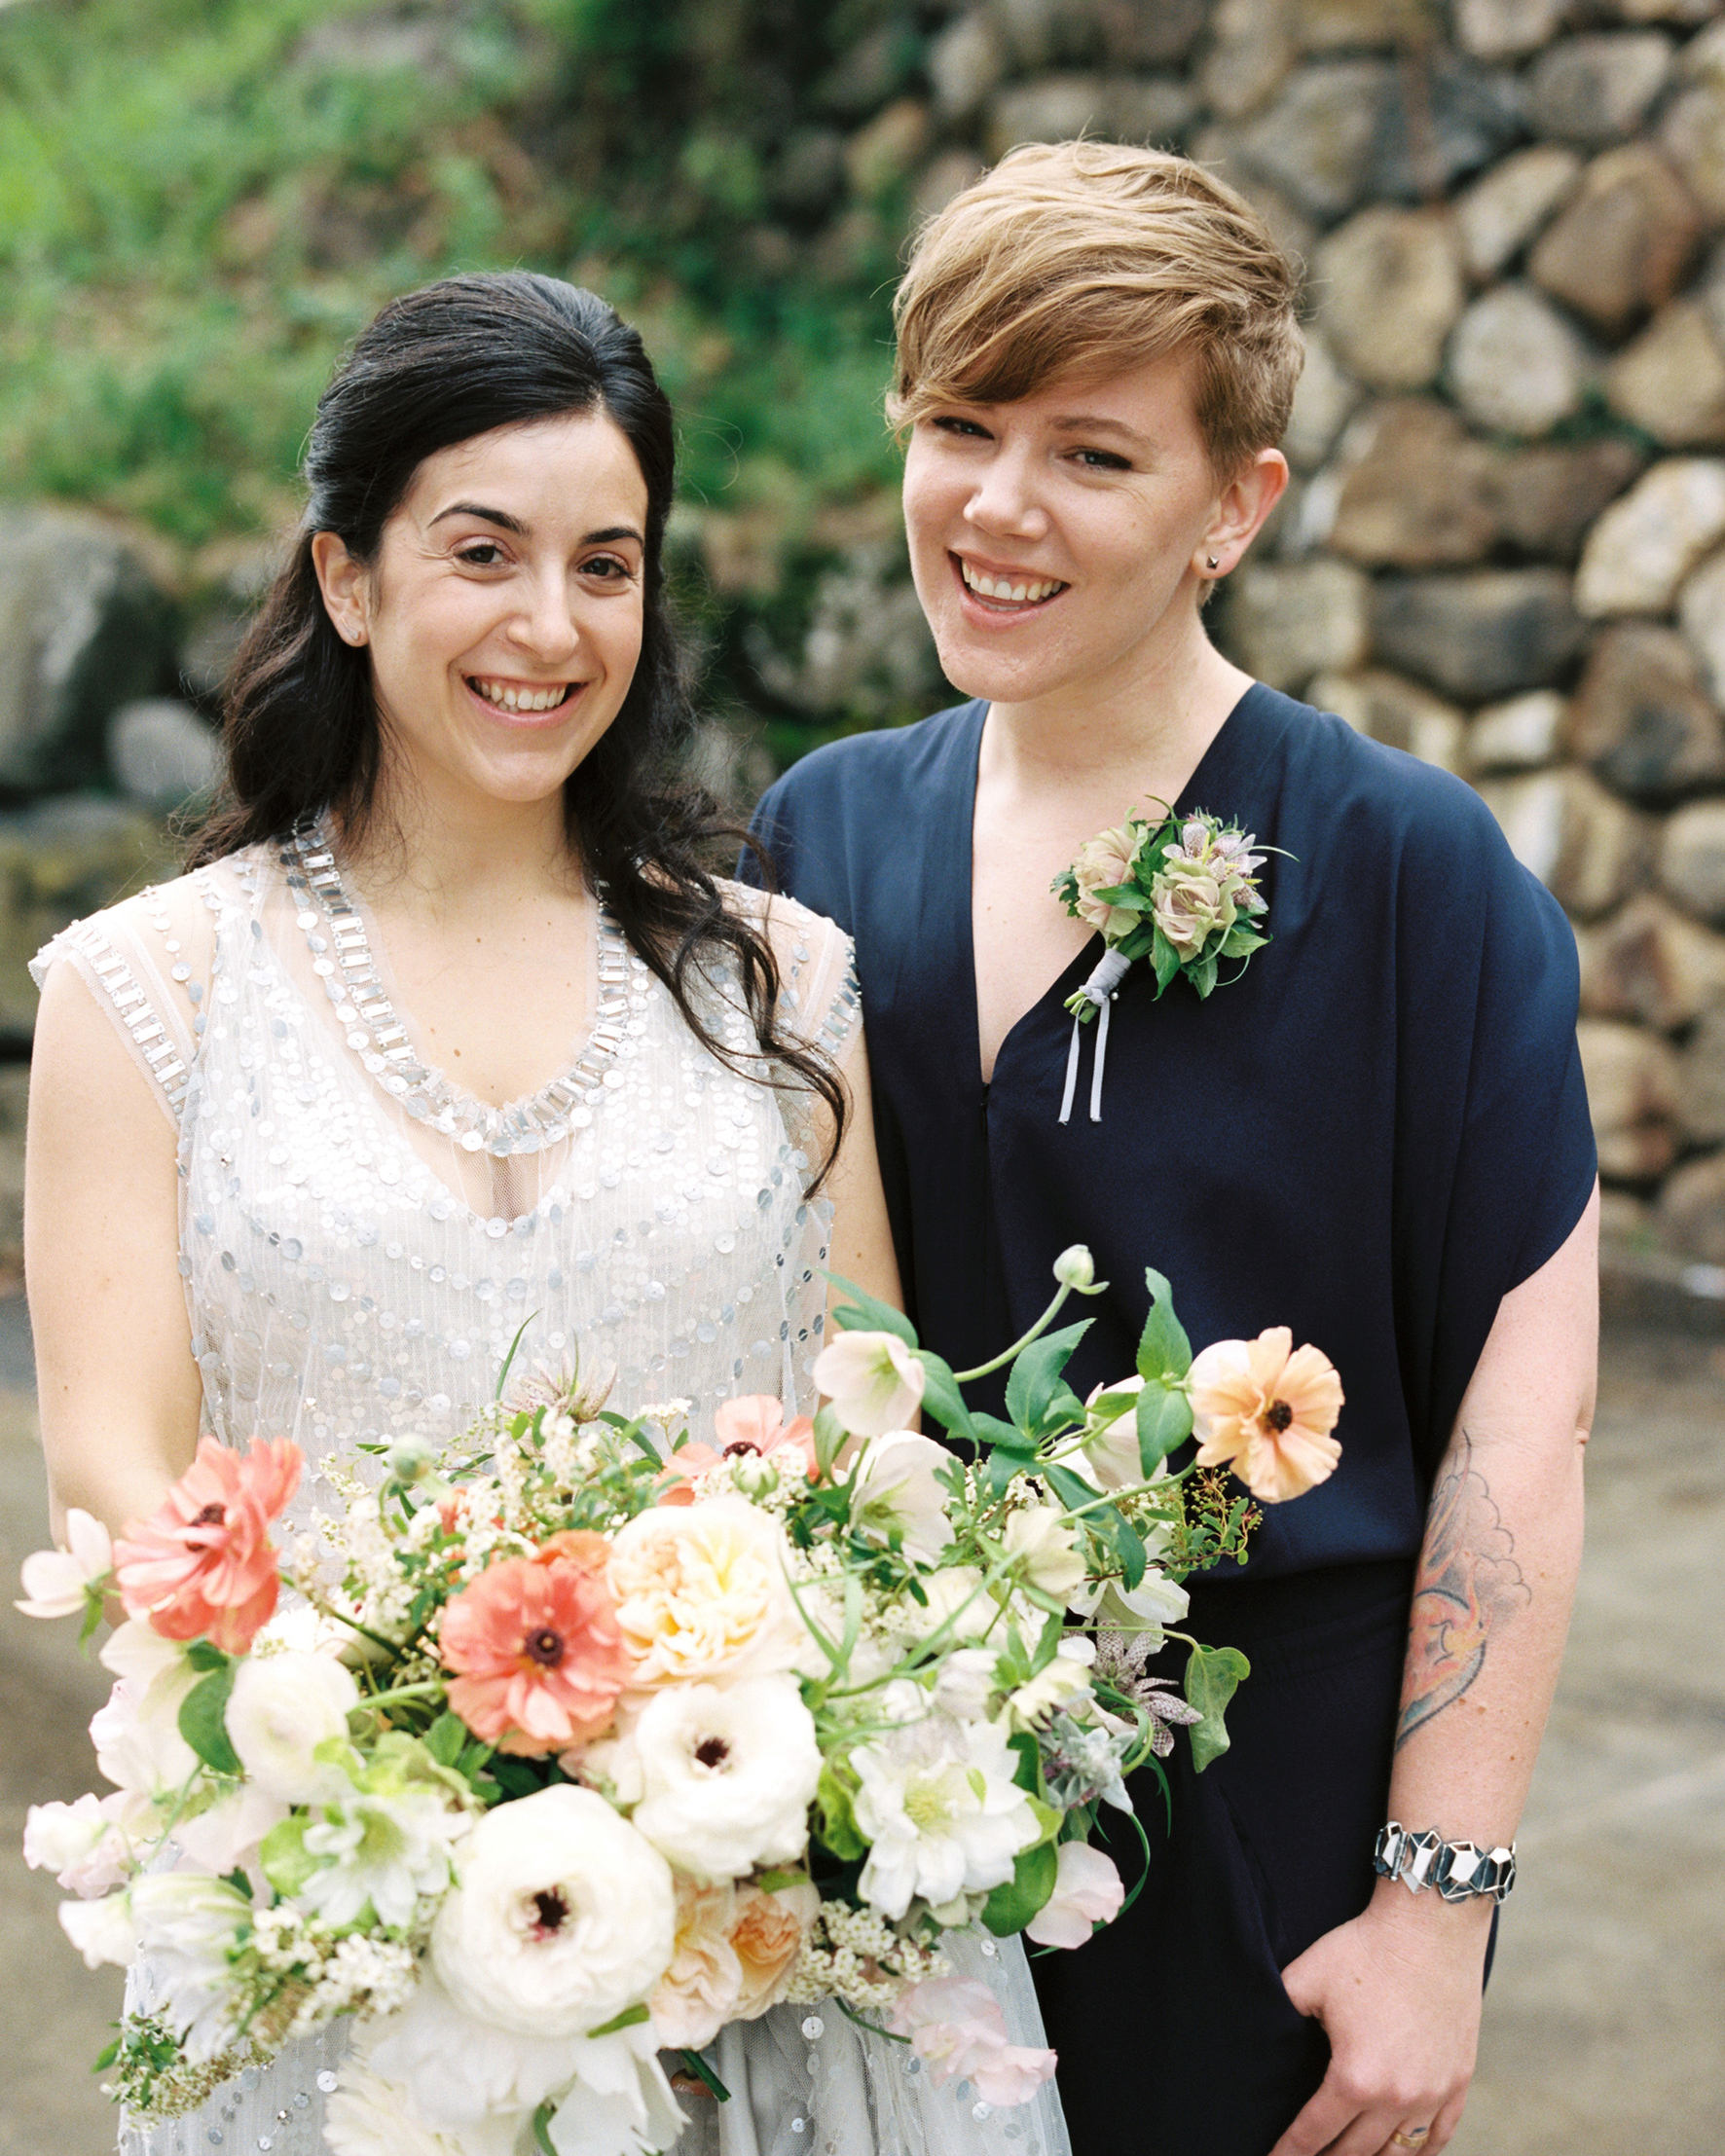 sydney-christina-wedding-couple-034-s111743-0115.jpg